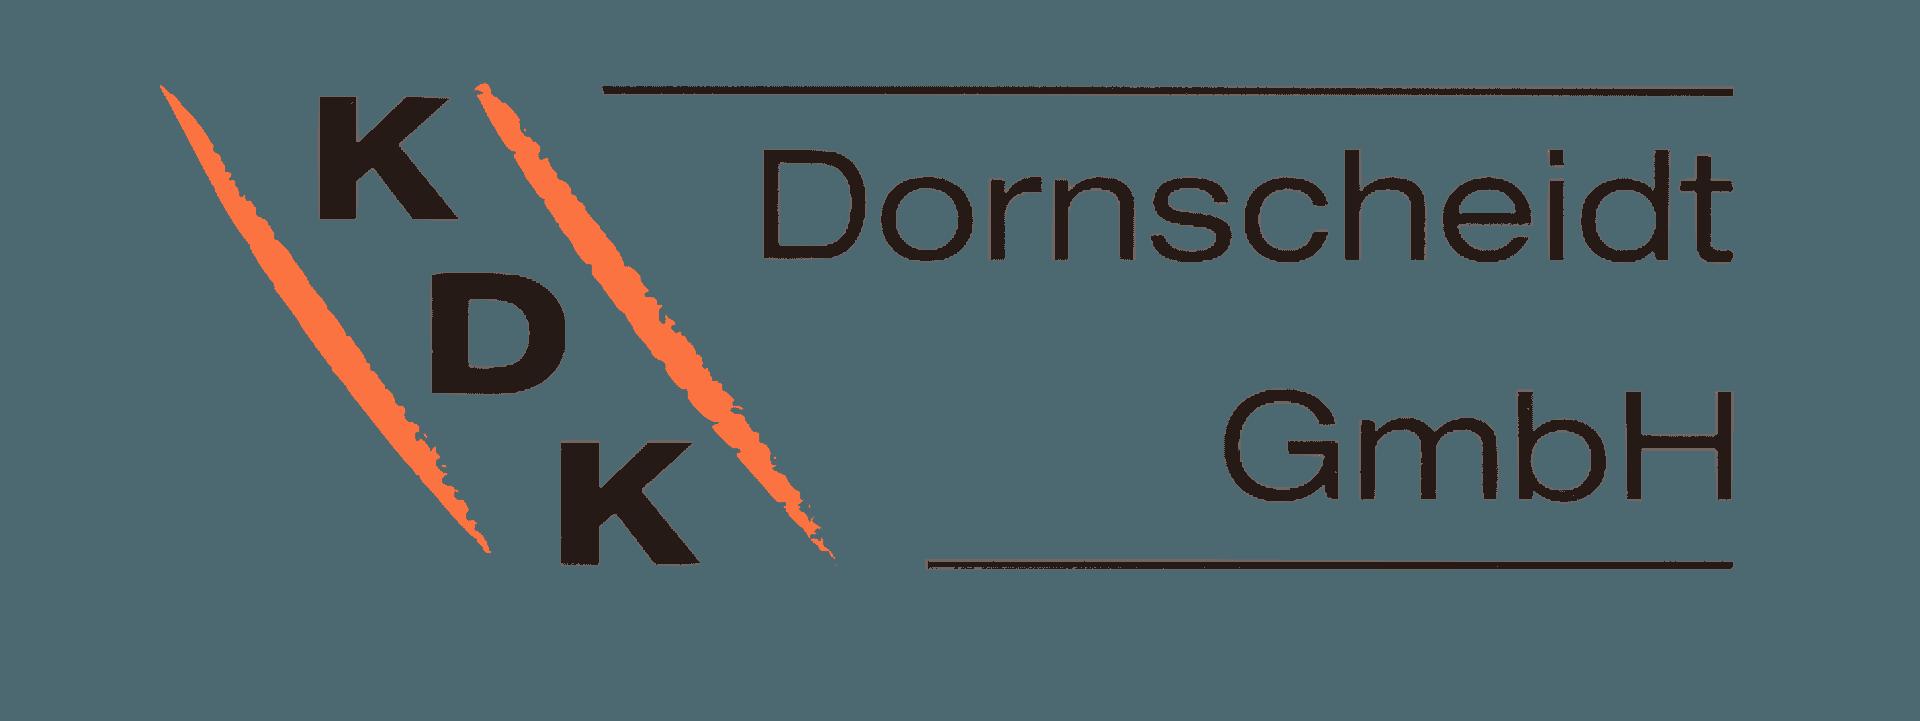 KDK Dornscheidt